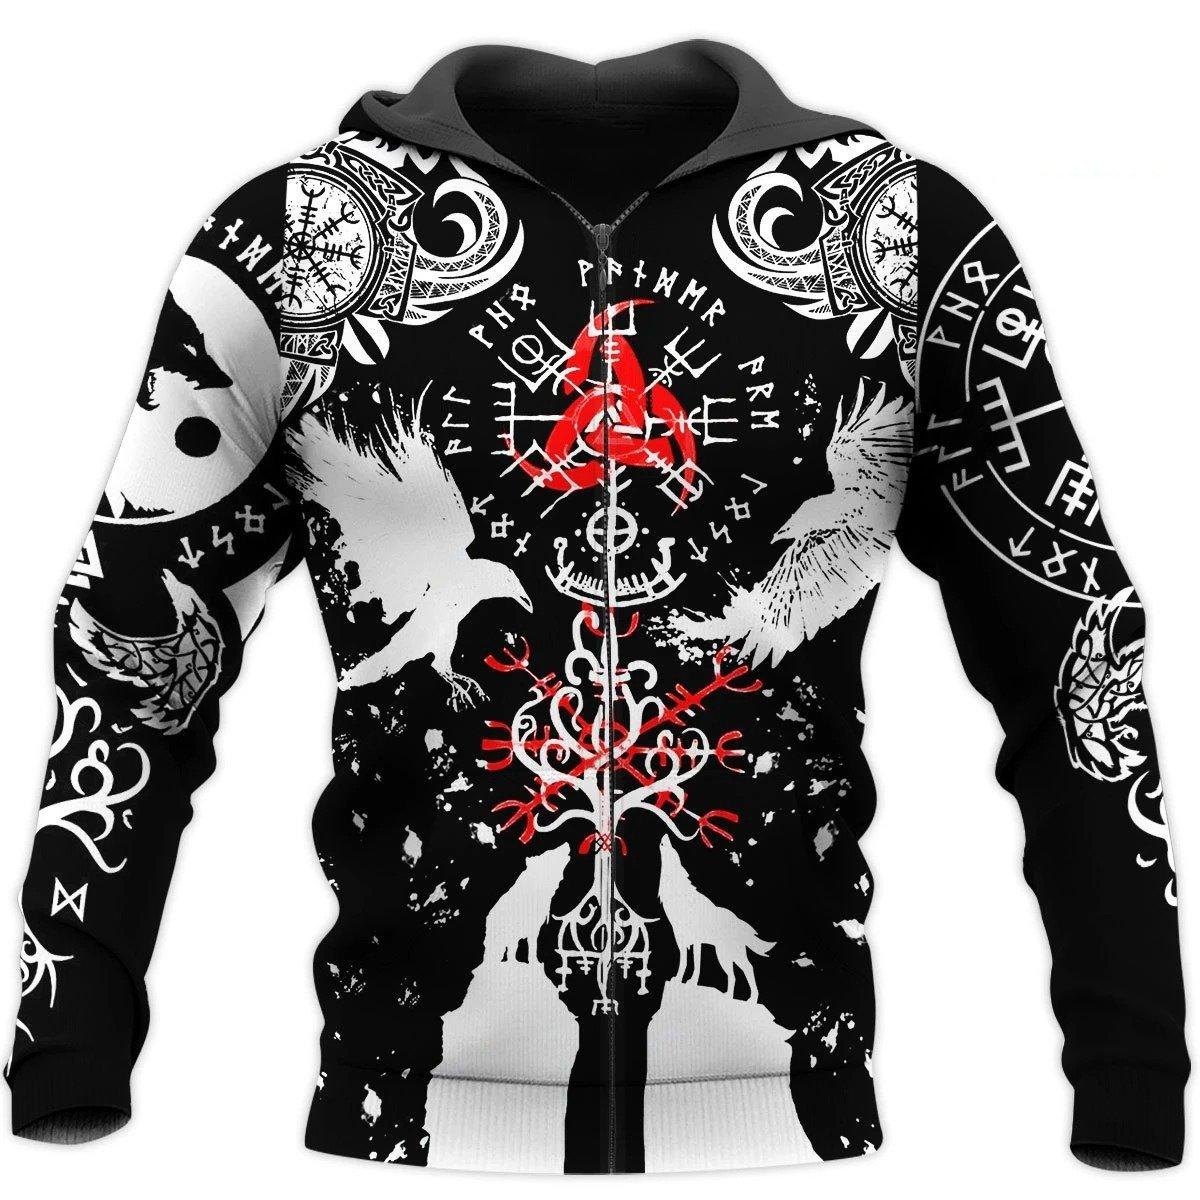 viking huginn and muninn all over printed zip hoodie